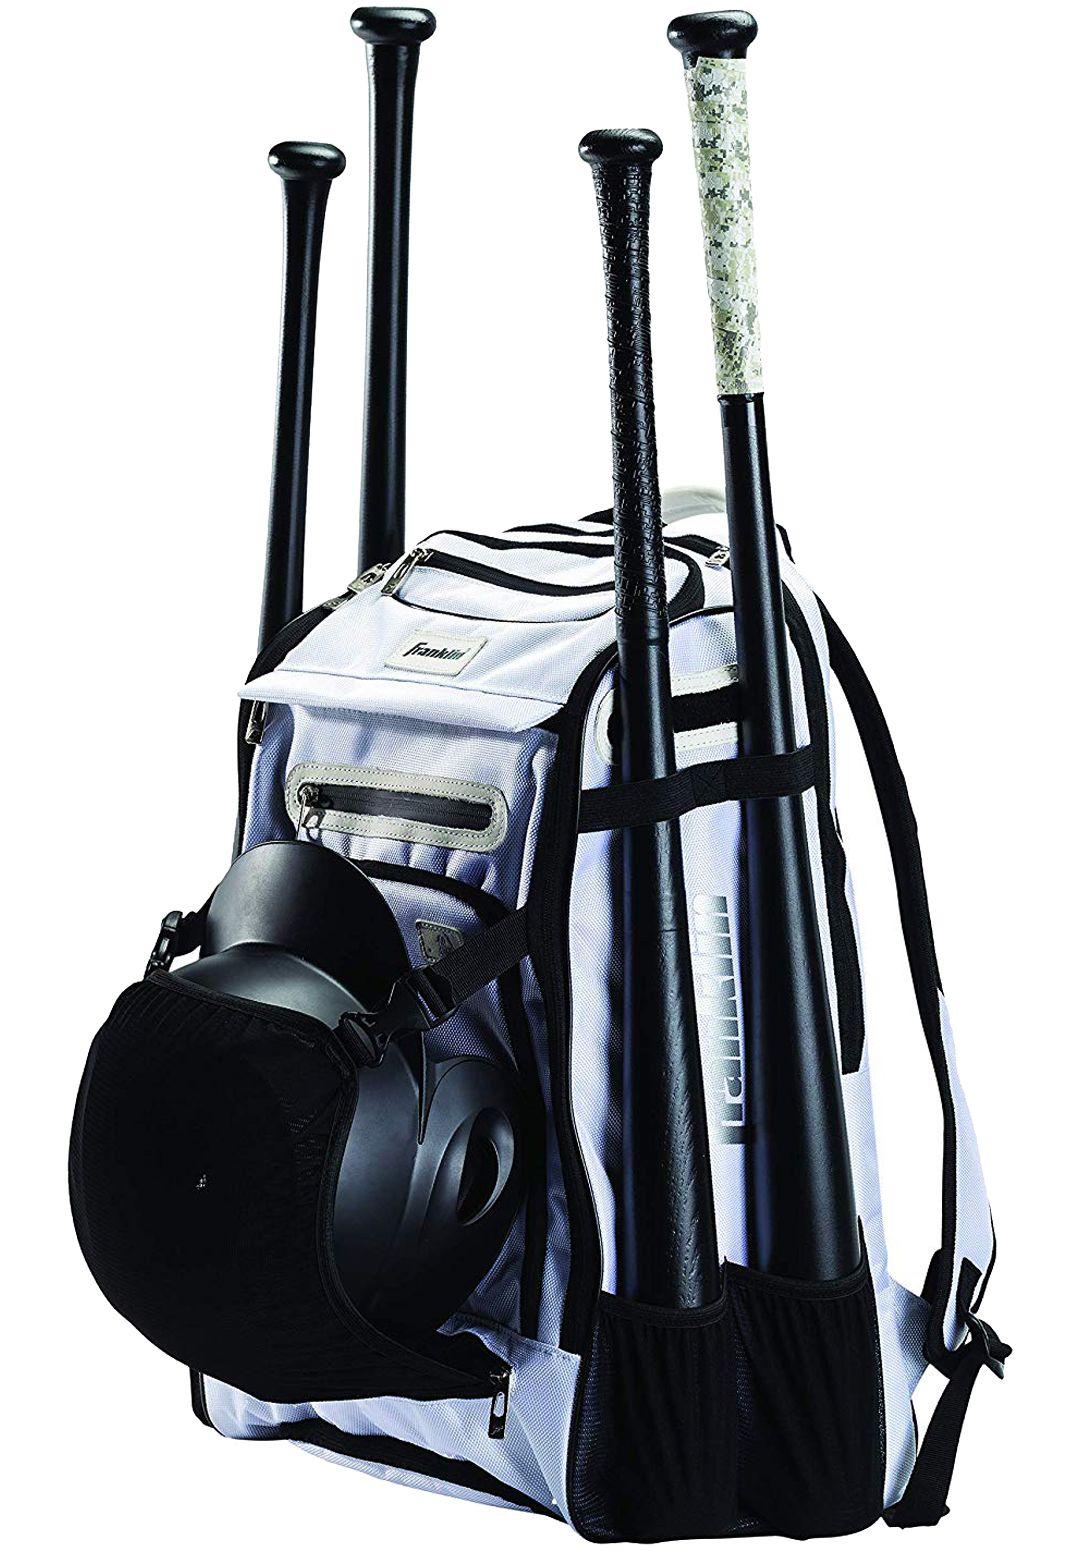 b86b244a9dbf Franklin MLB Traveler Elite Chrome Bat Pack